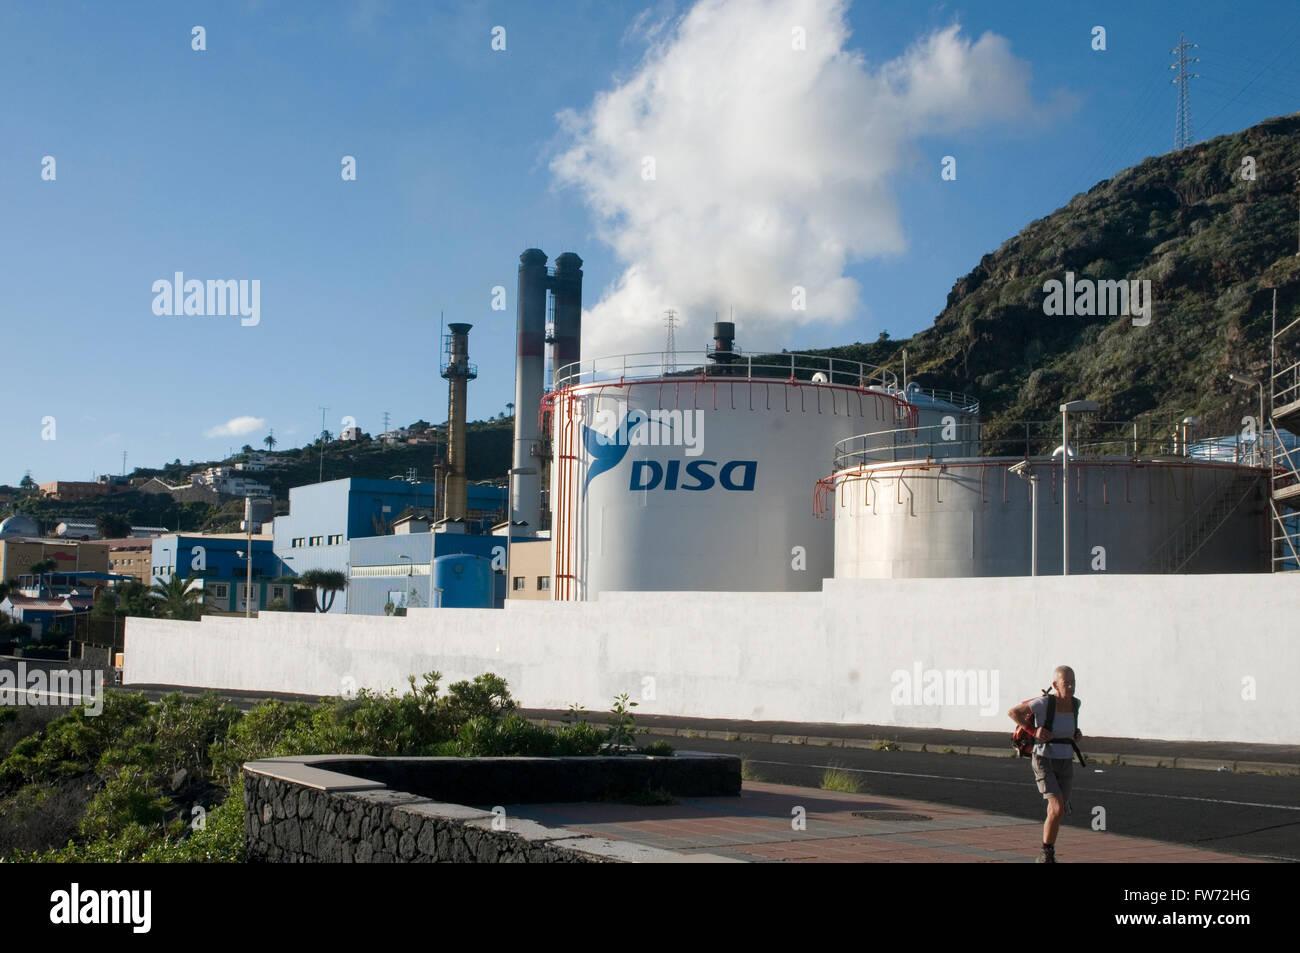 oil fired power station stations powerstation powerstations disel generator generators santa cruz de la plama canary - Stock Image